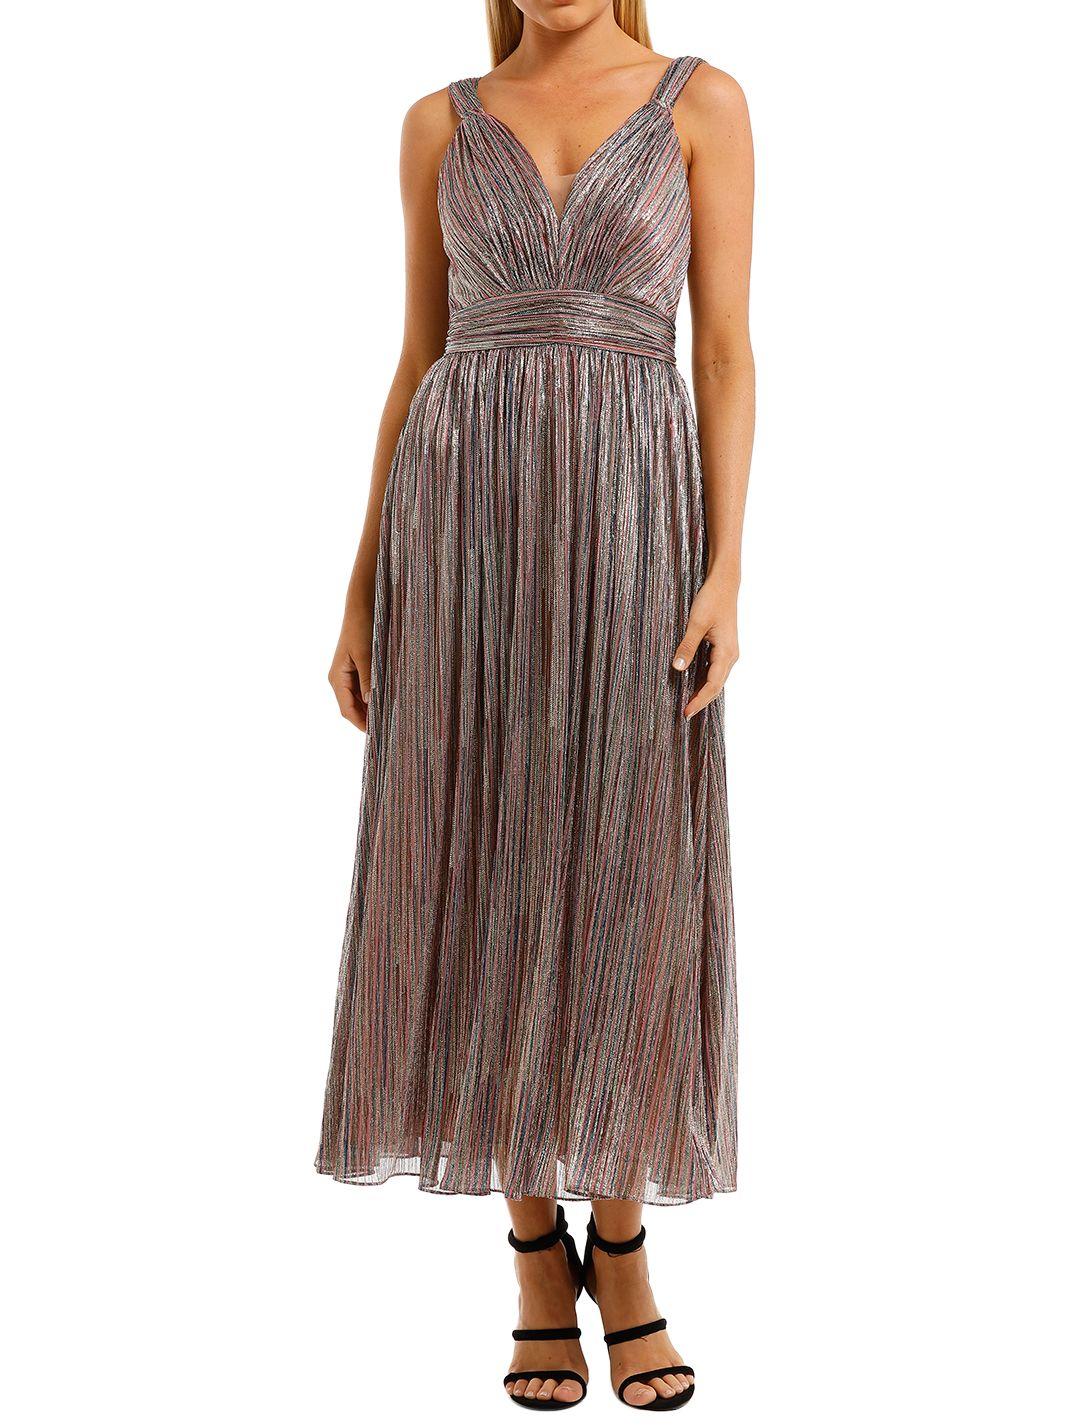 Catherine-Deane-Nikola-Dress-Metallics-Front